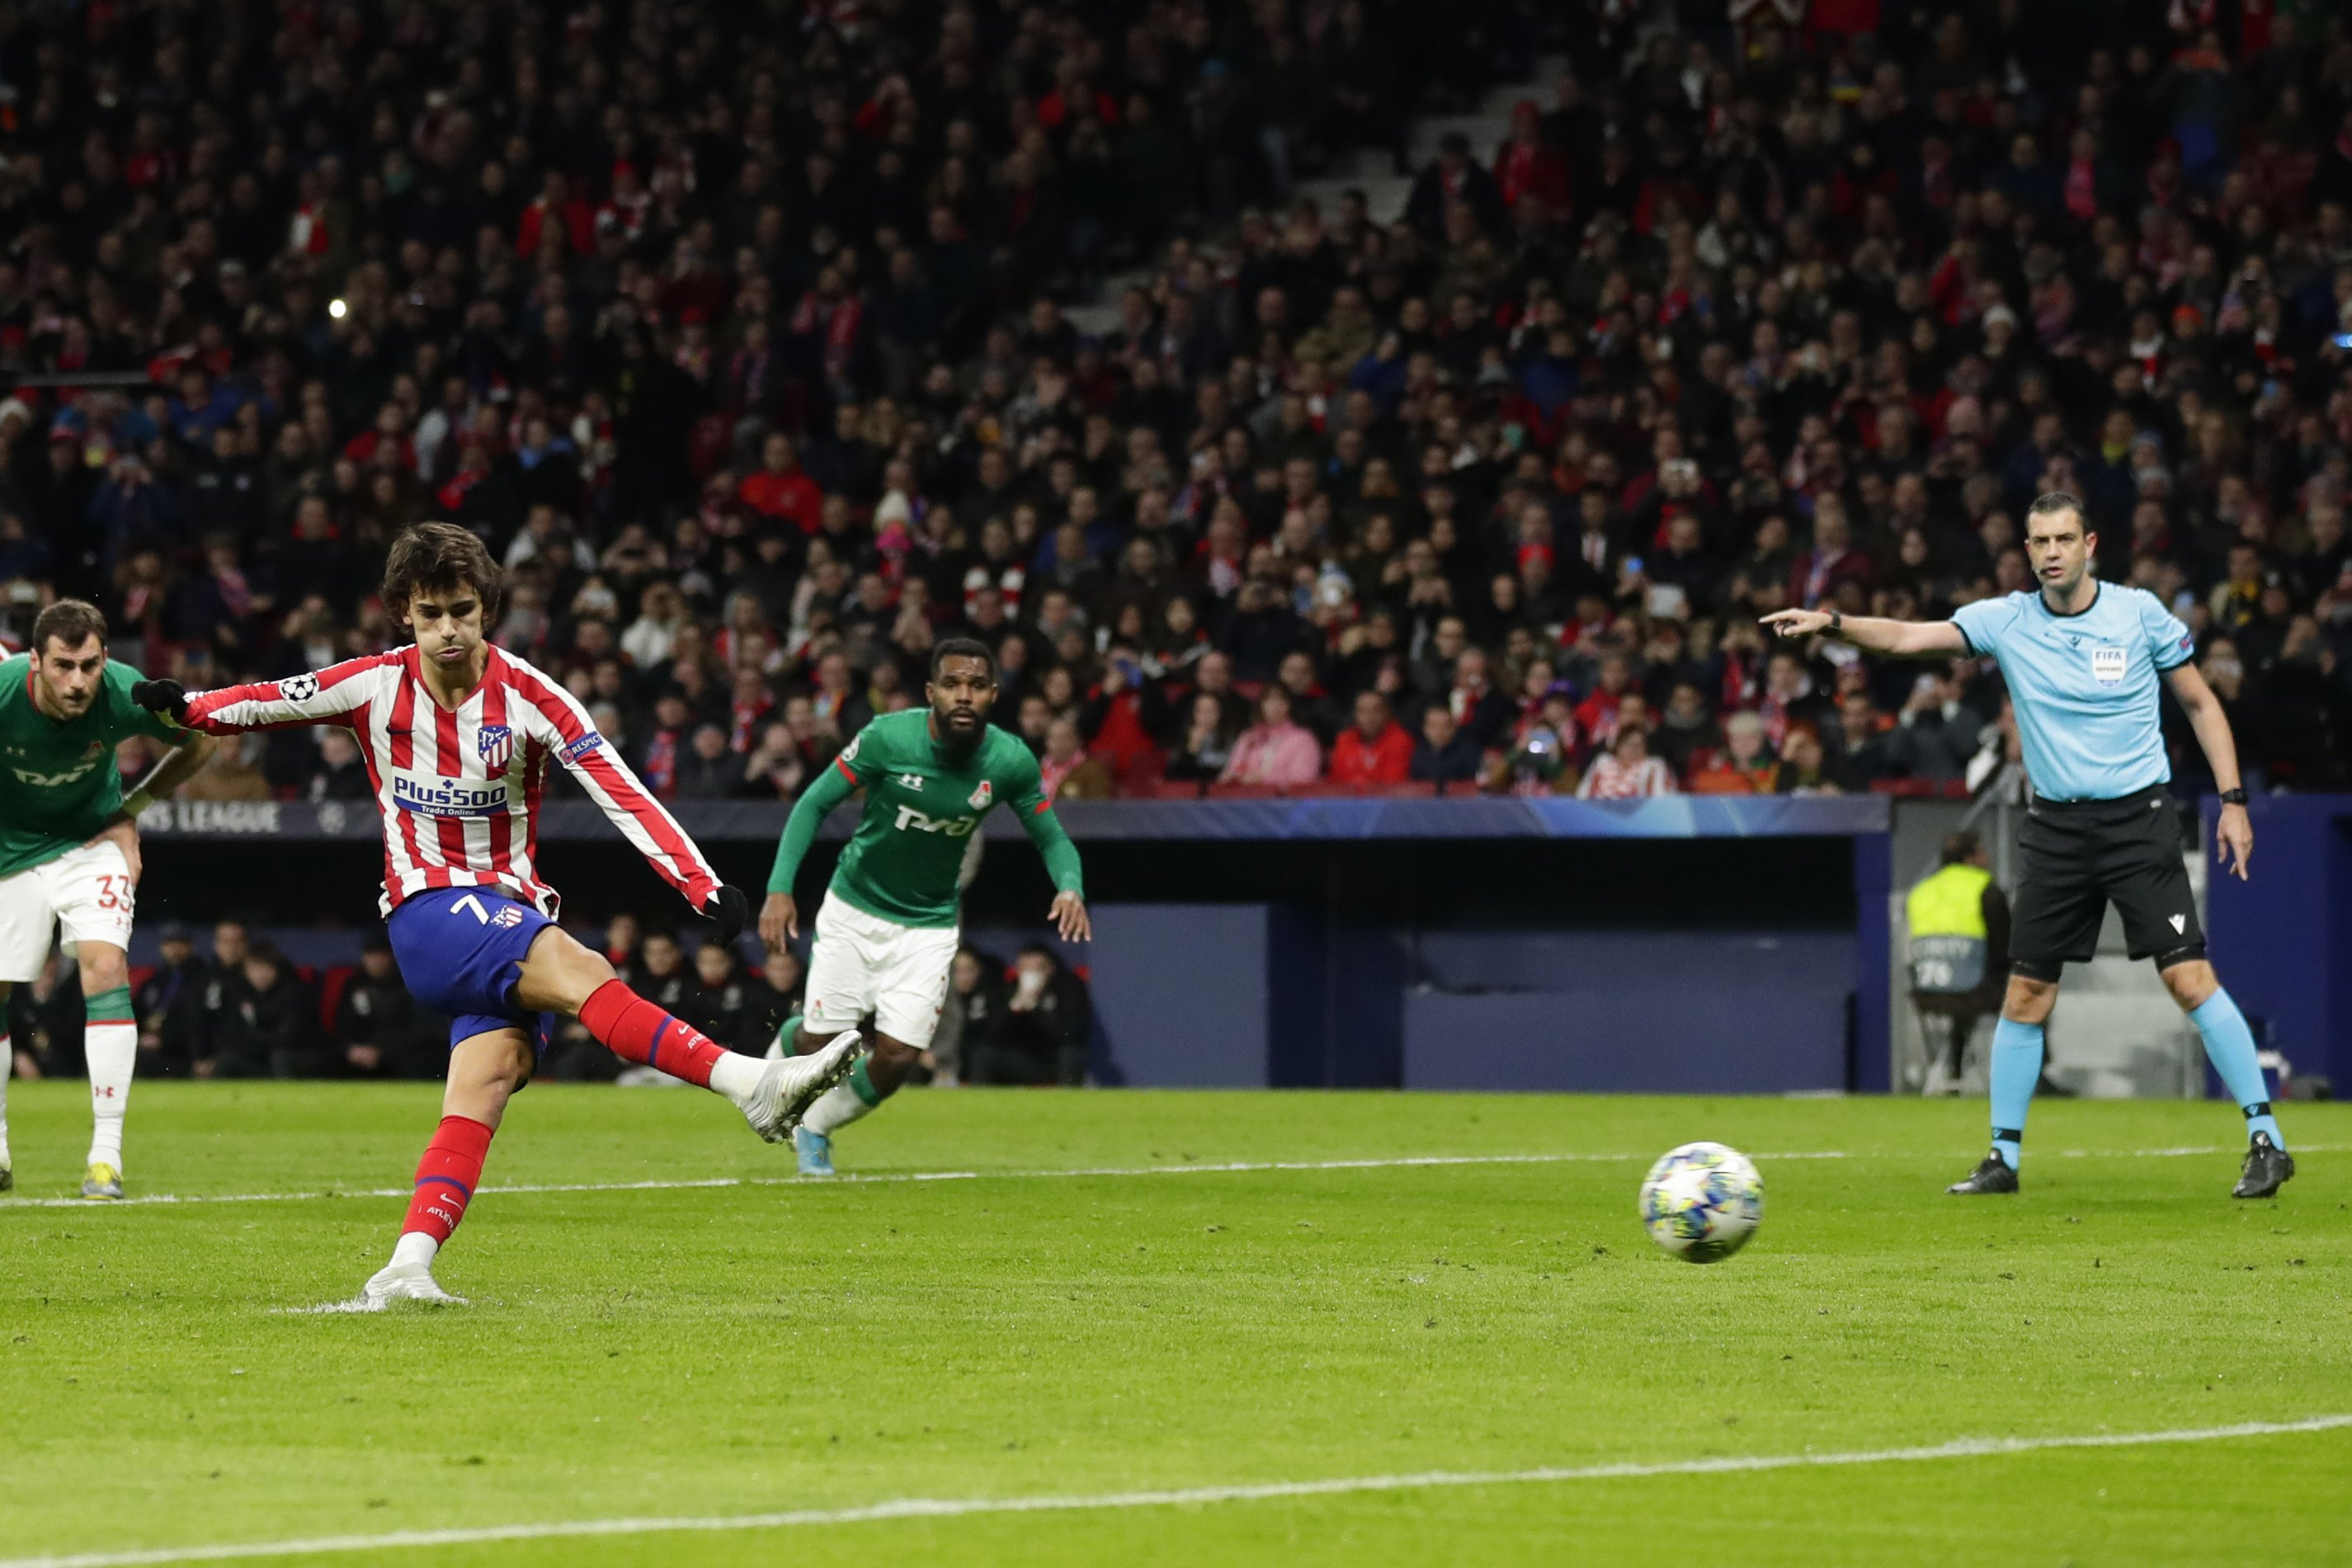 Atlético beats Lokomotiv 2-0 to advance in Champions League